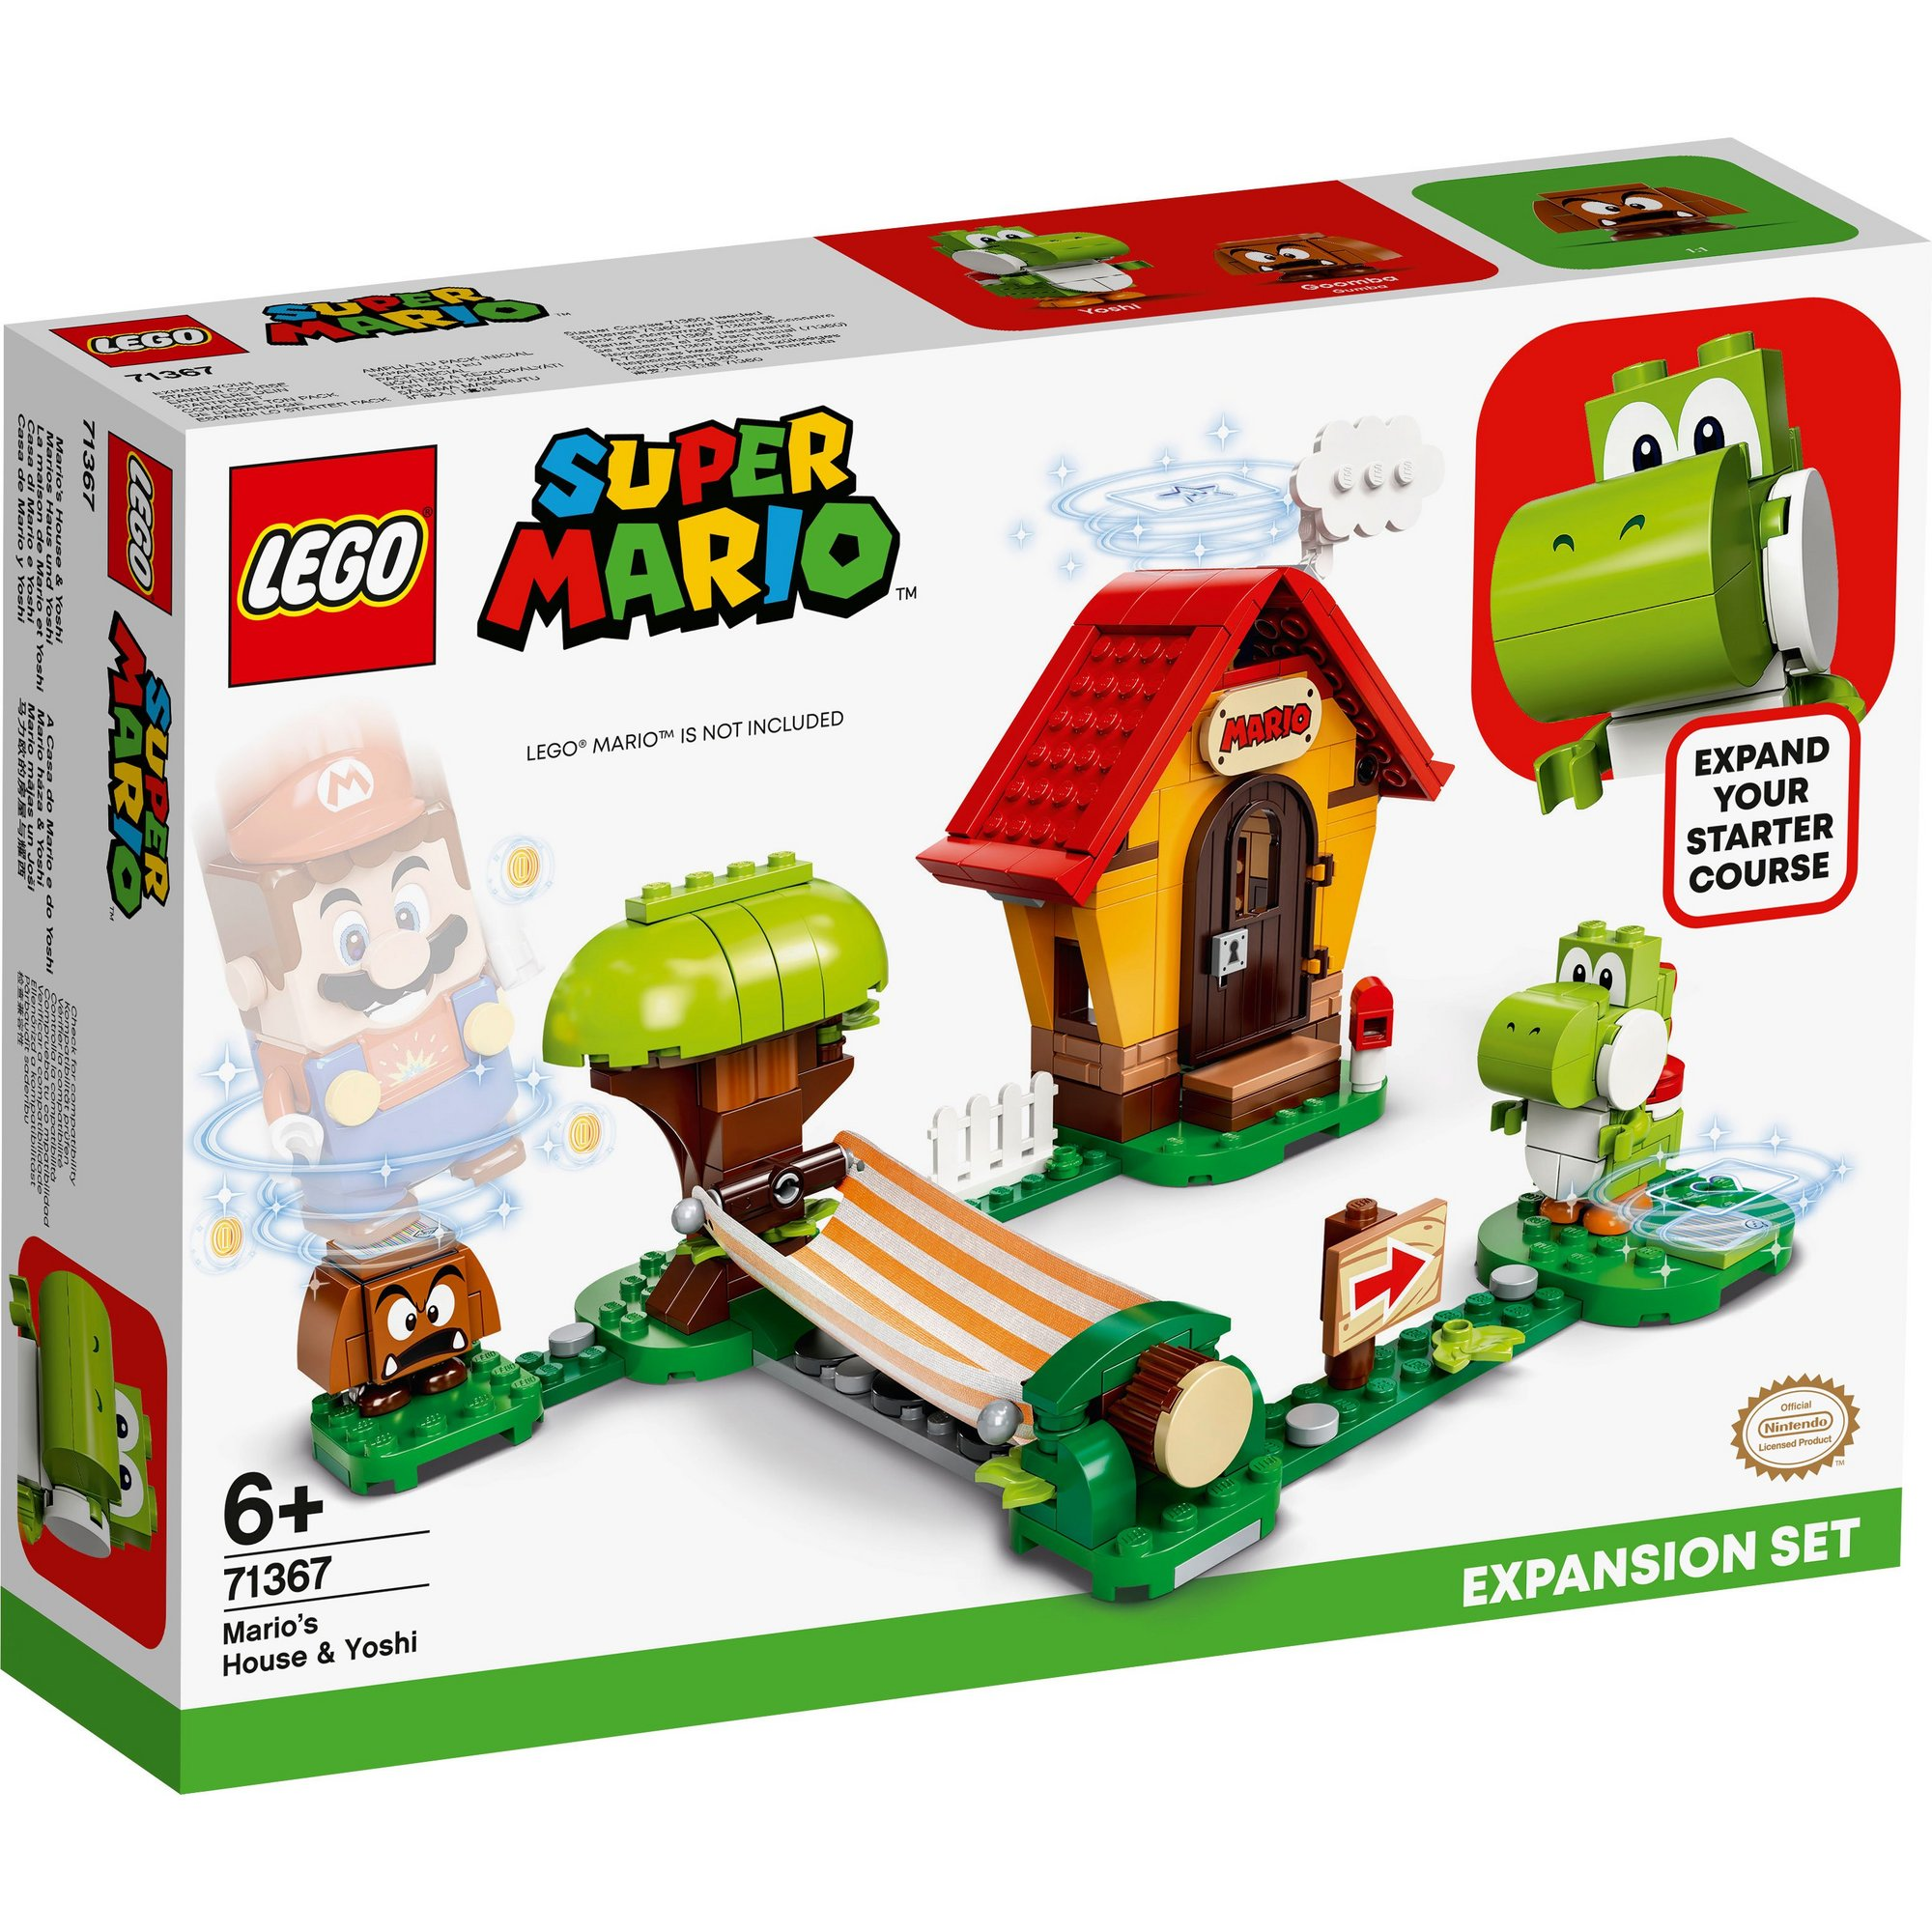 Image of LEGO Super Mario Marios House and Yoshi Expansion Set